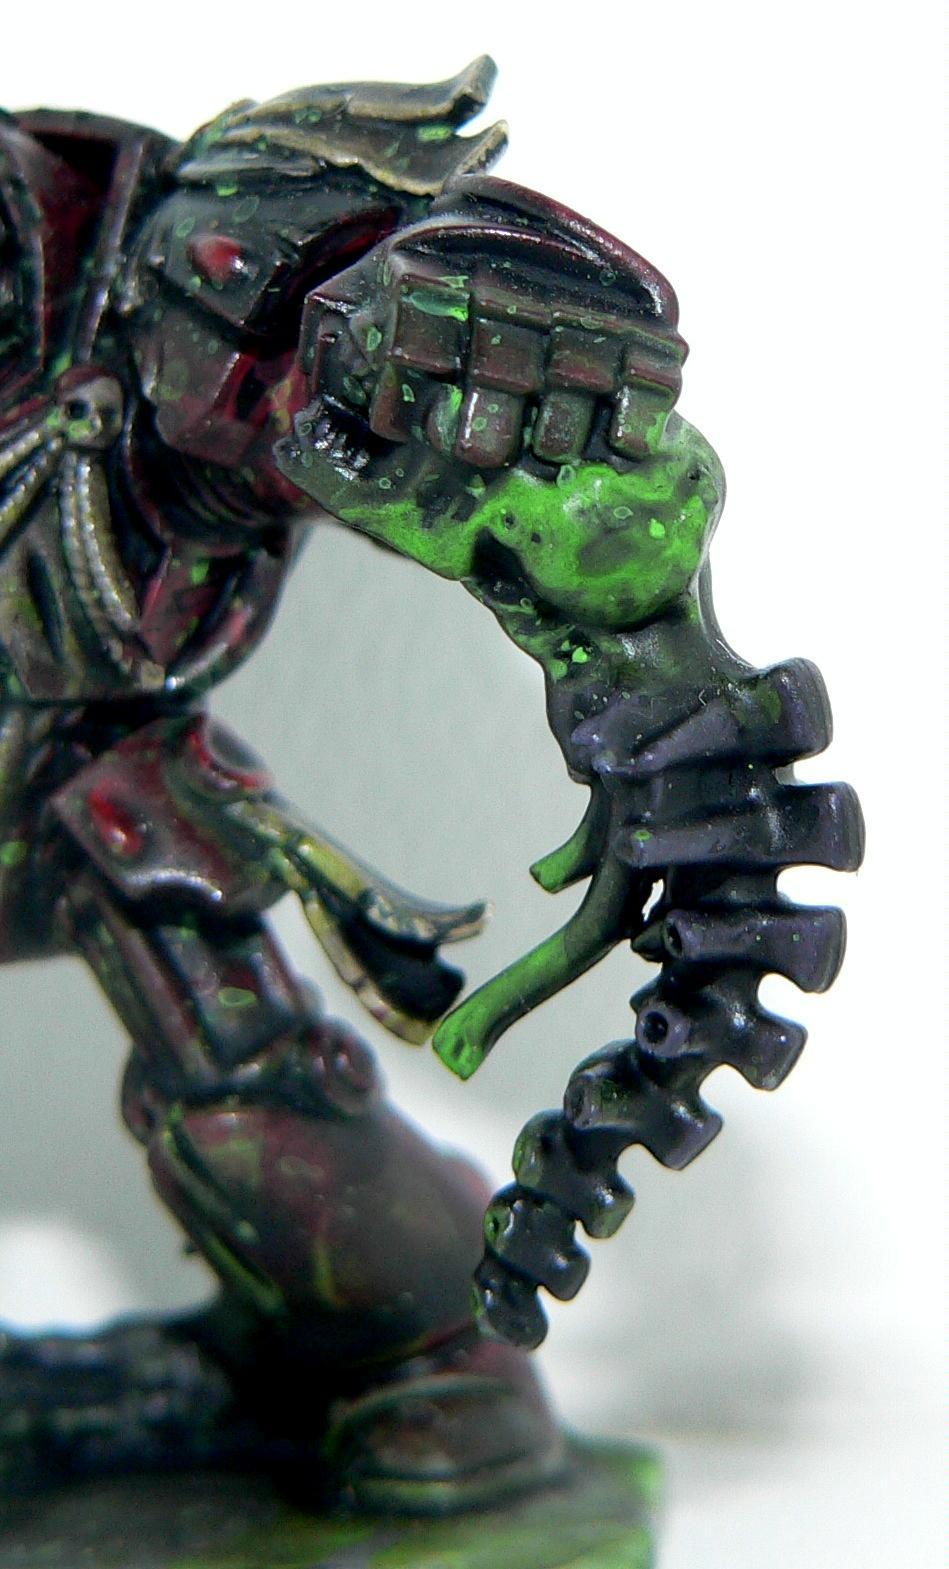 Flesh Tearers, Space Hulk, Space Marines, Warhammer 40,000